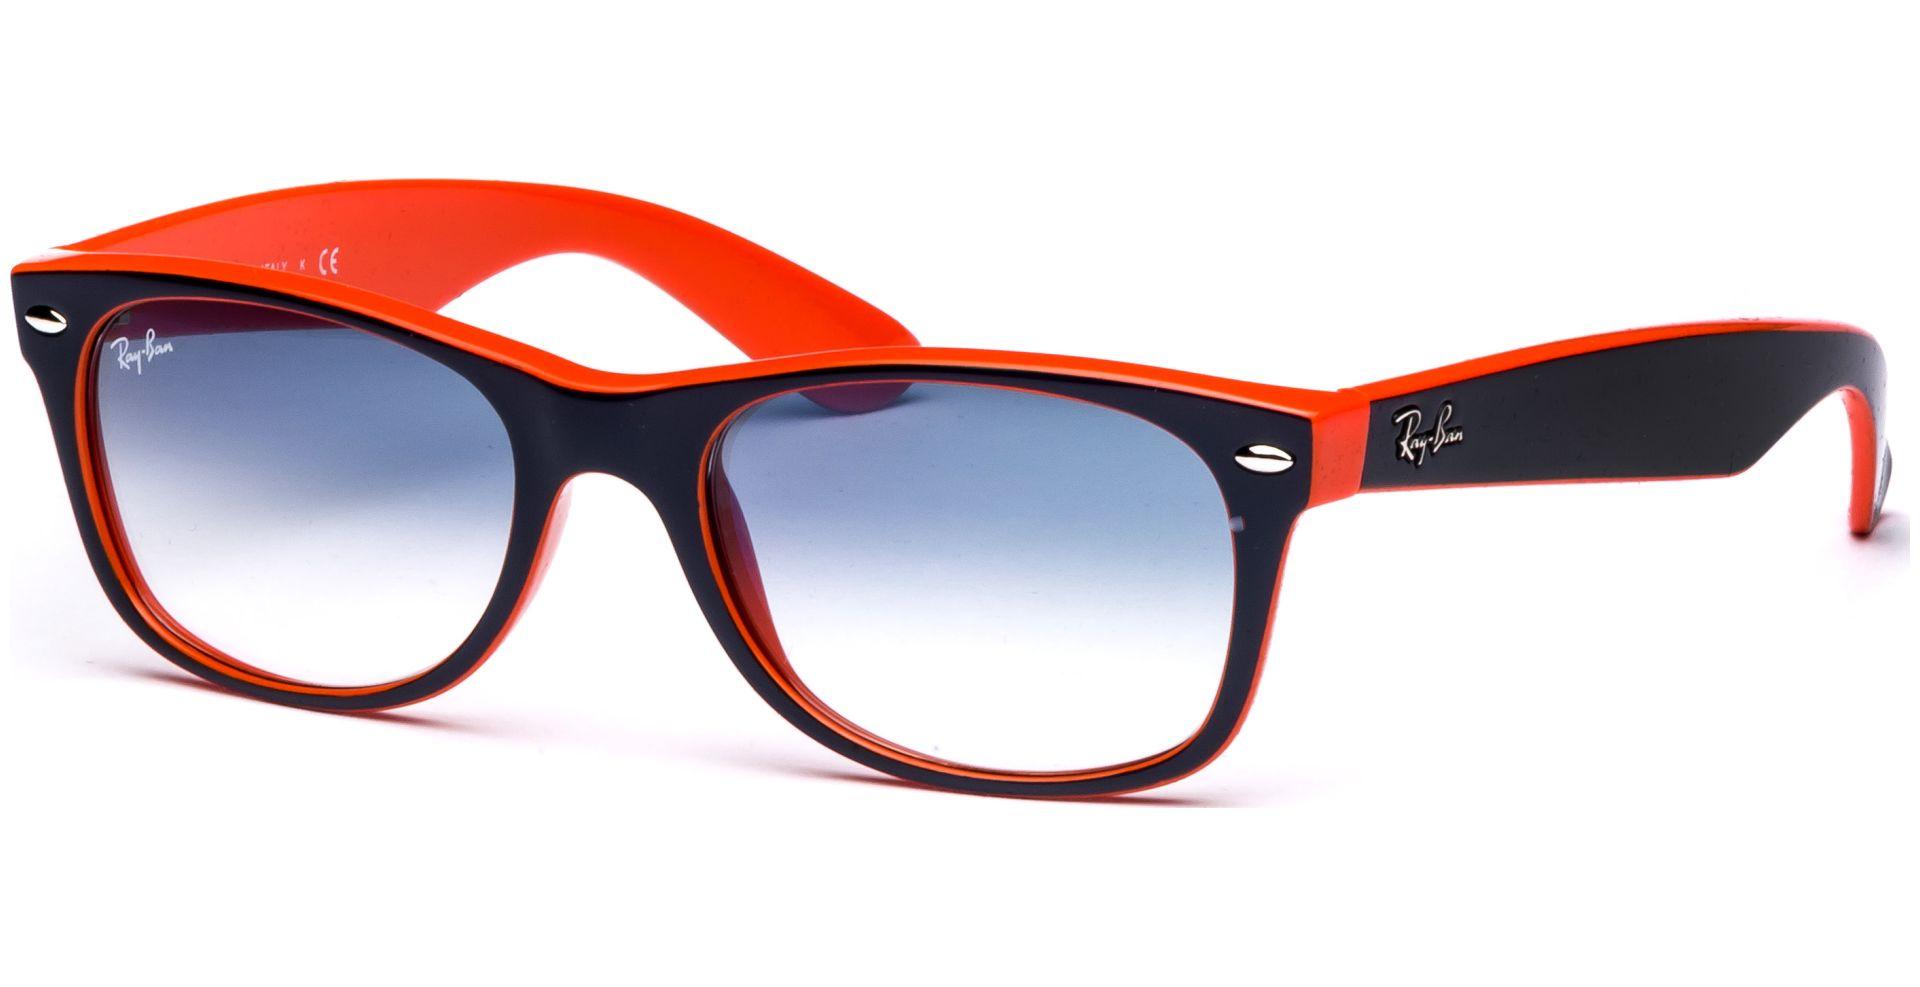 Ray-Ban - New Wayfarer 2132 789/3F 5218 Top Blue Orange/Crystal ...